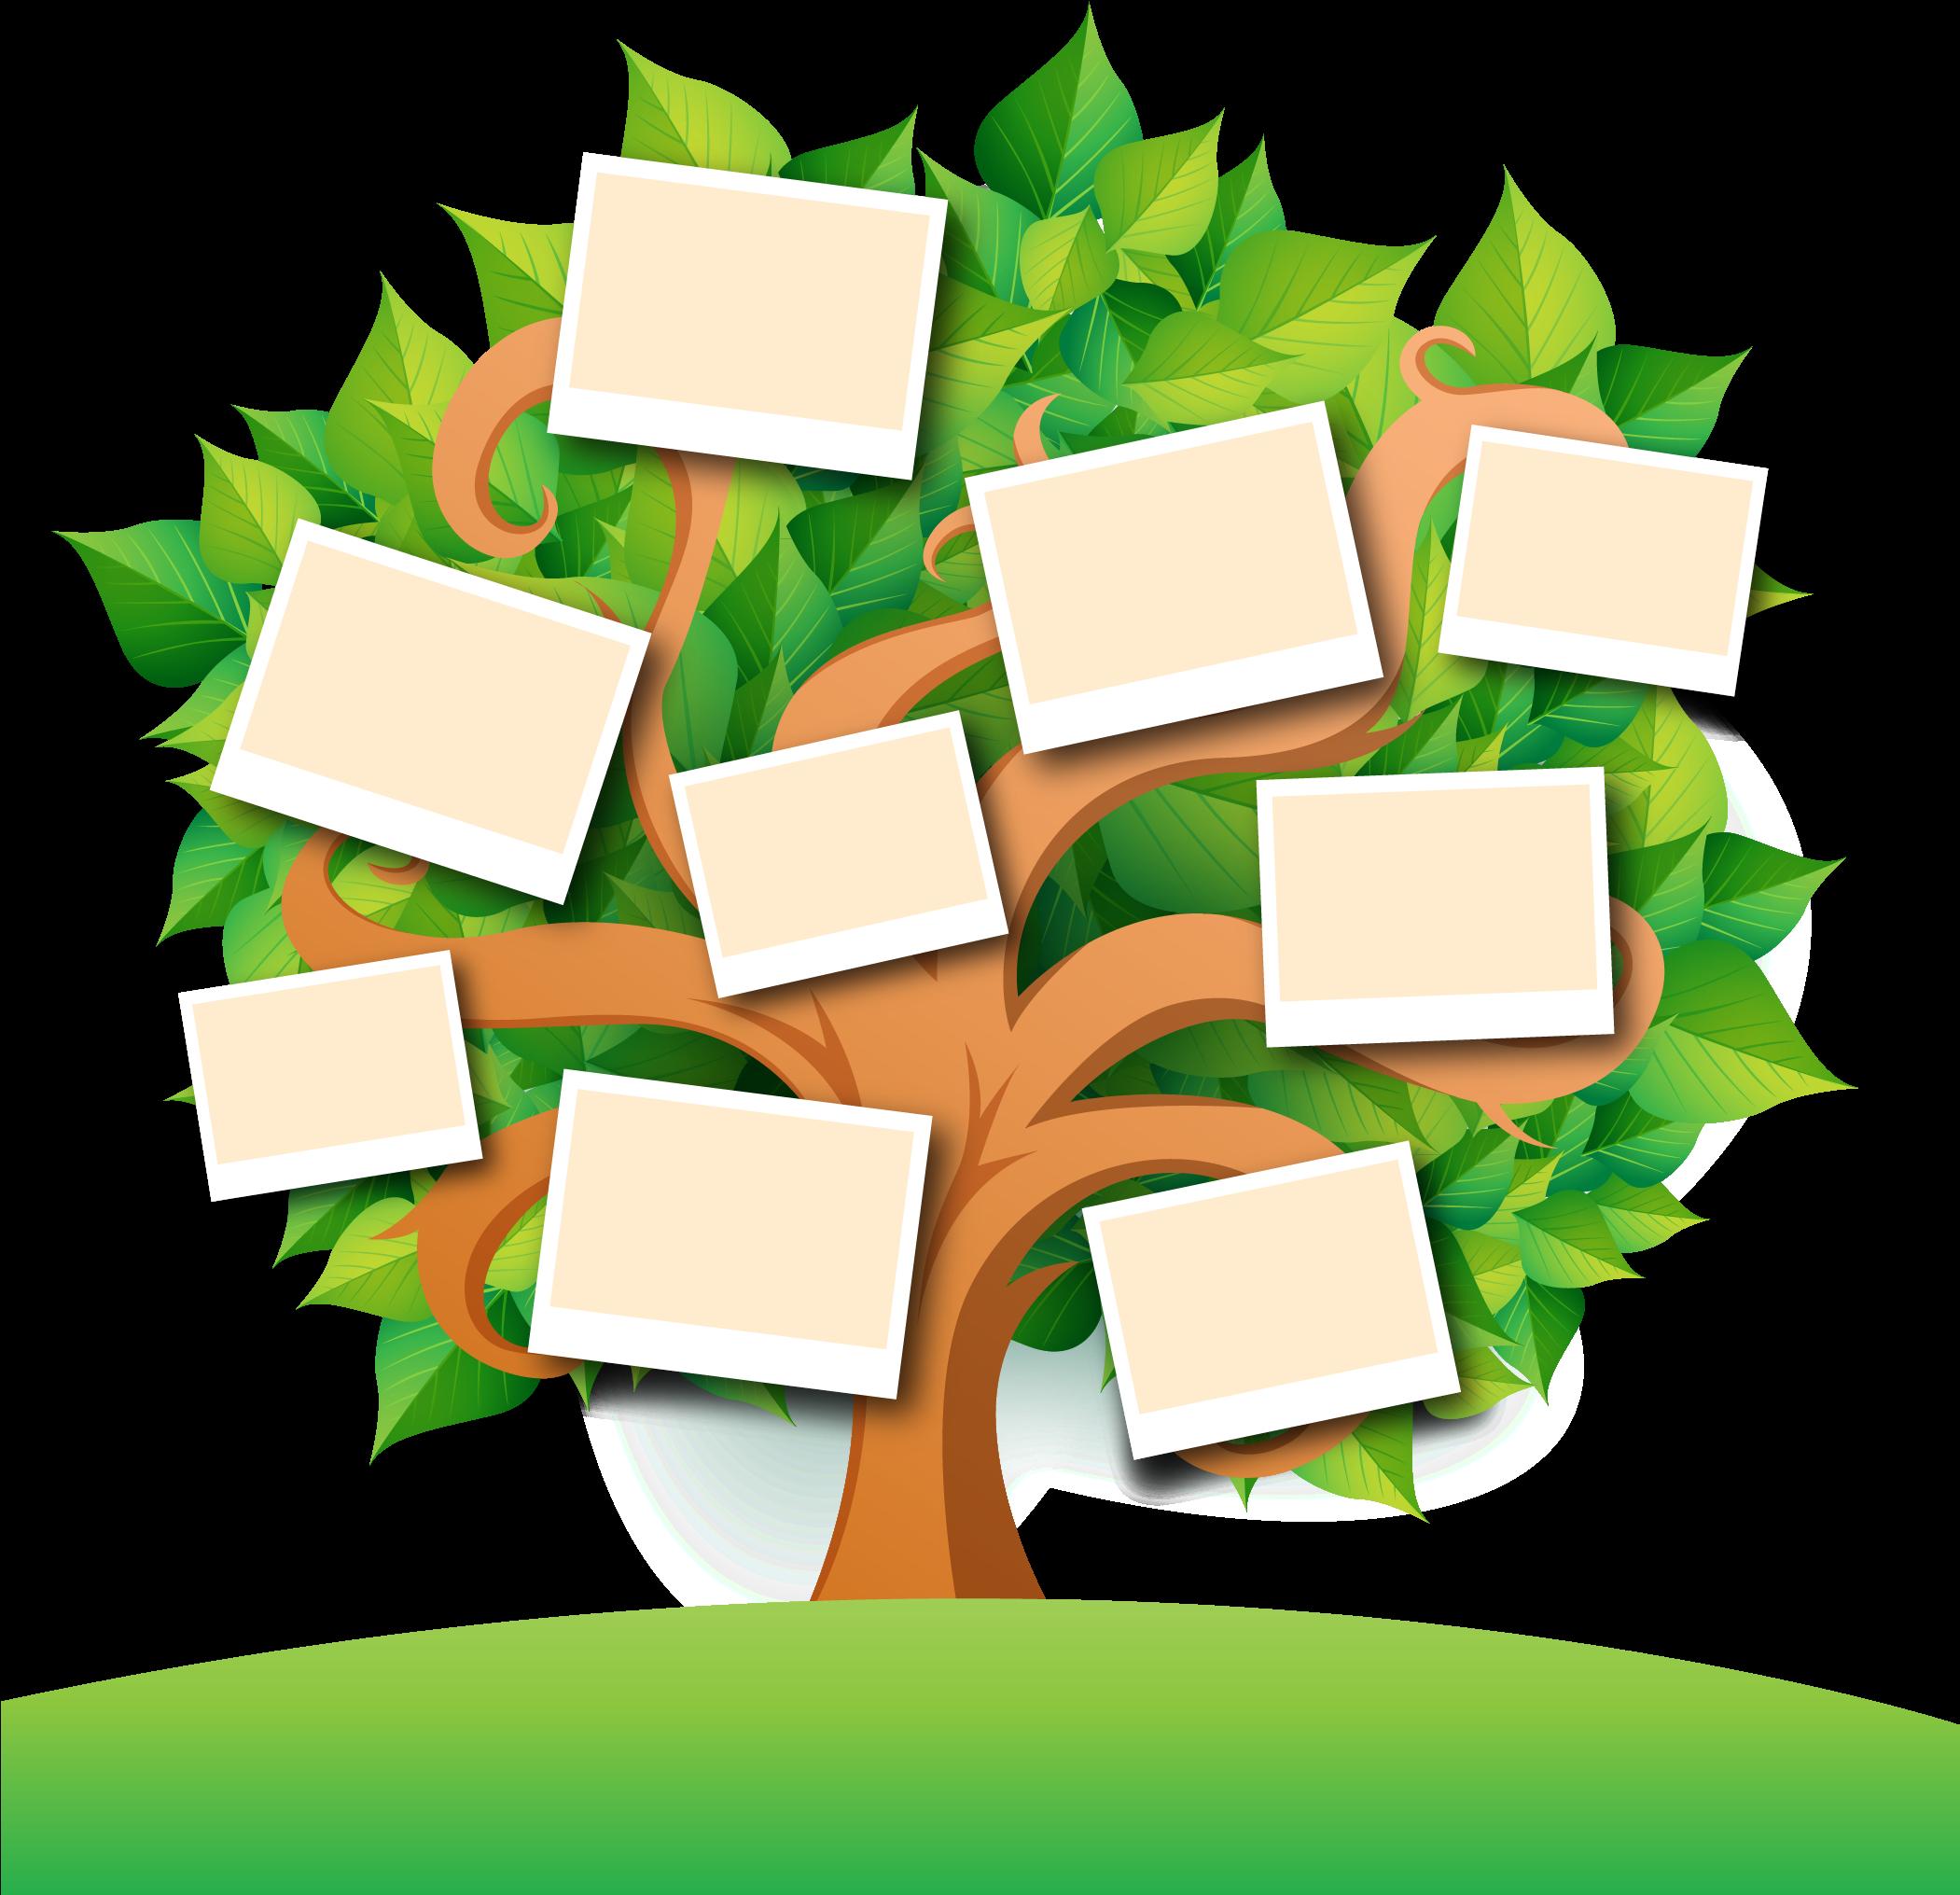 картинки дерева для проекта существовании крепостного